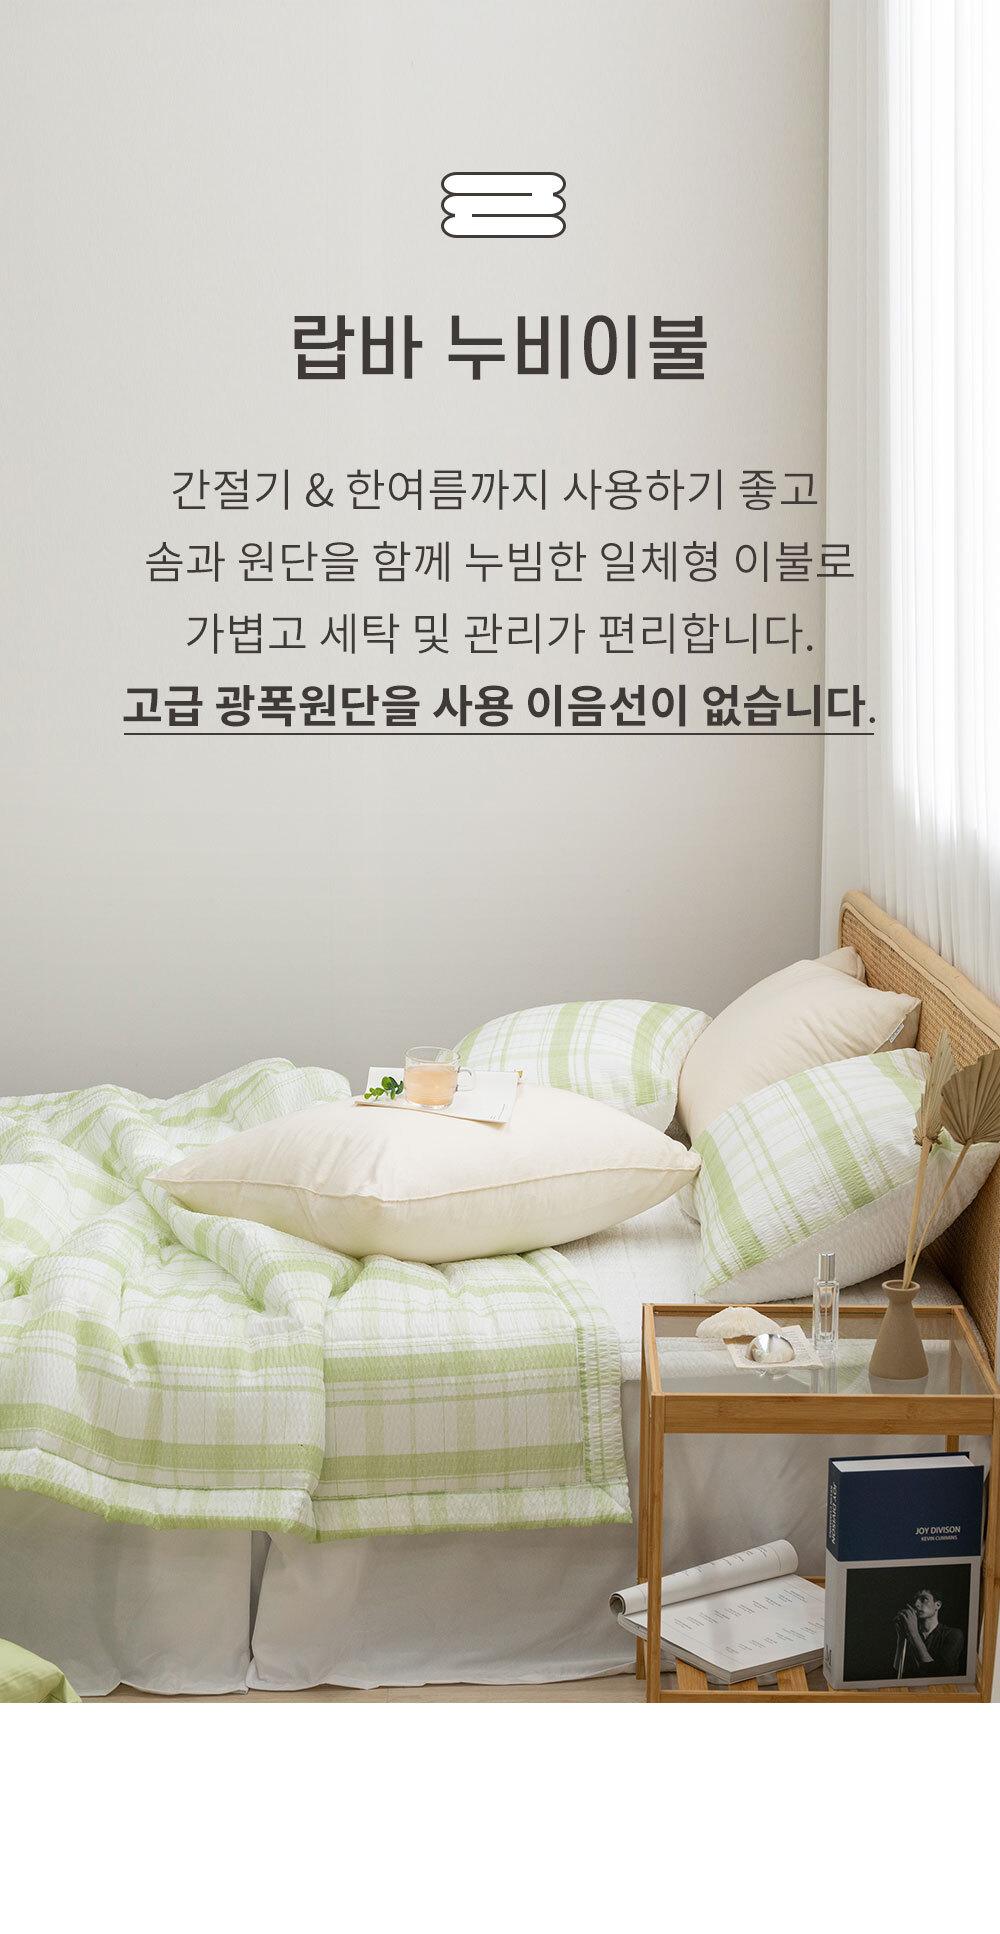 butterring_bed_06.jpg